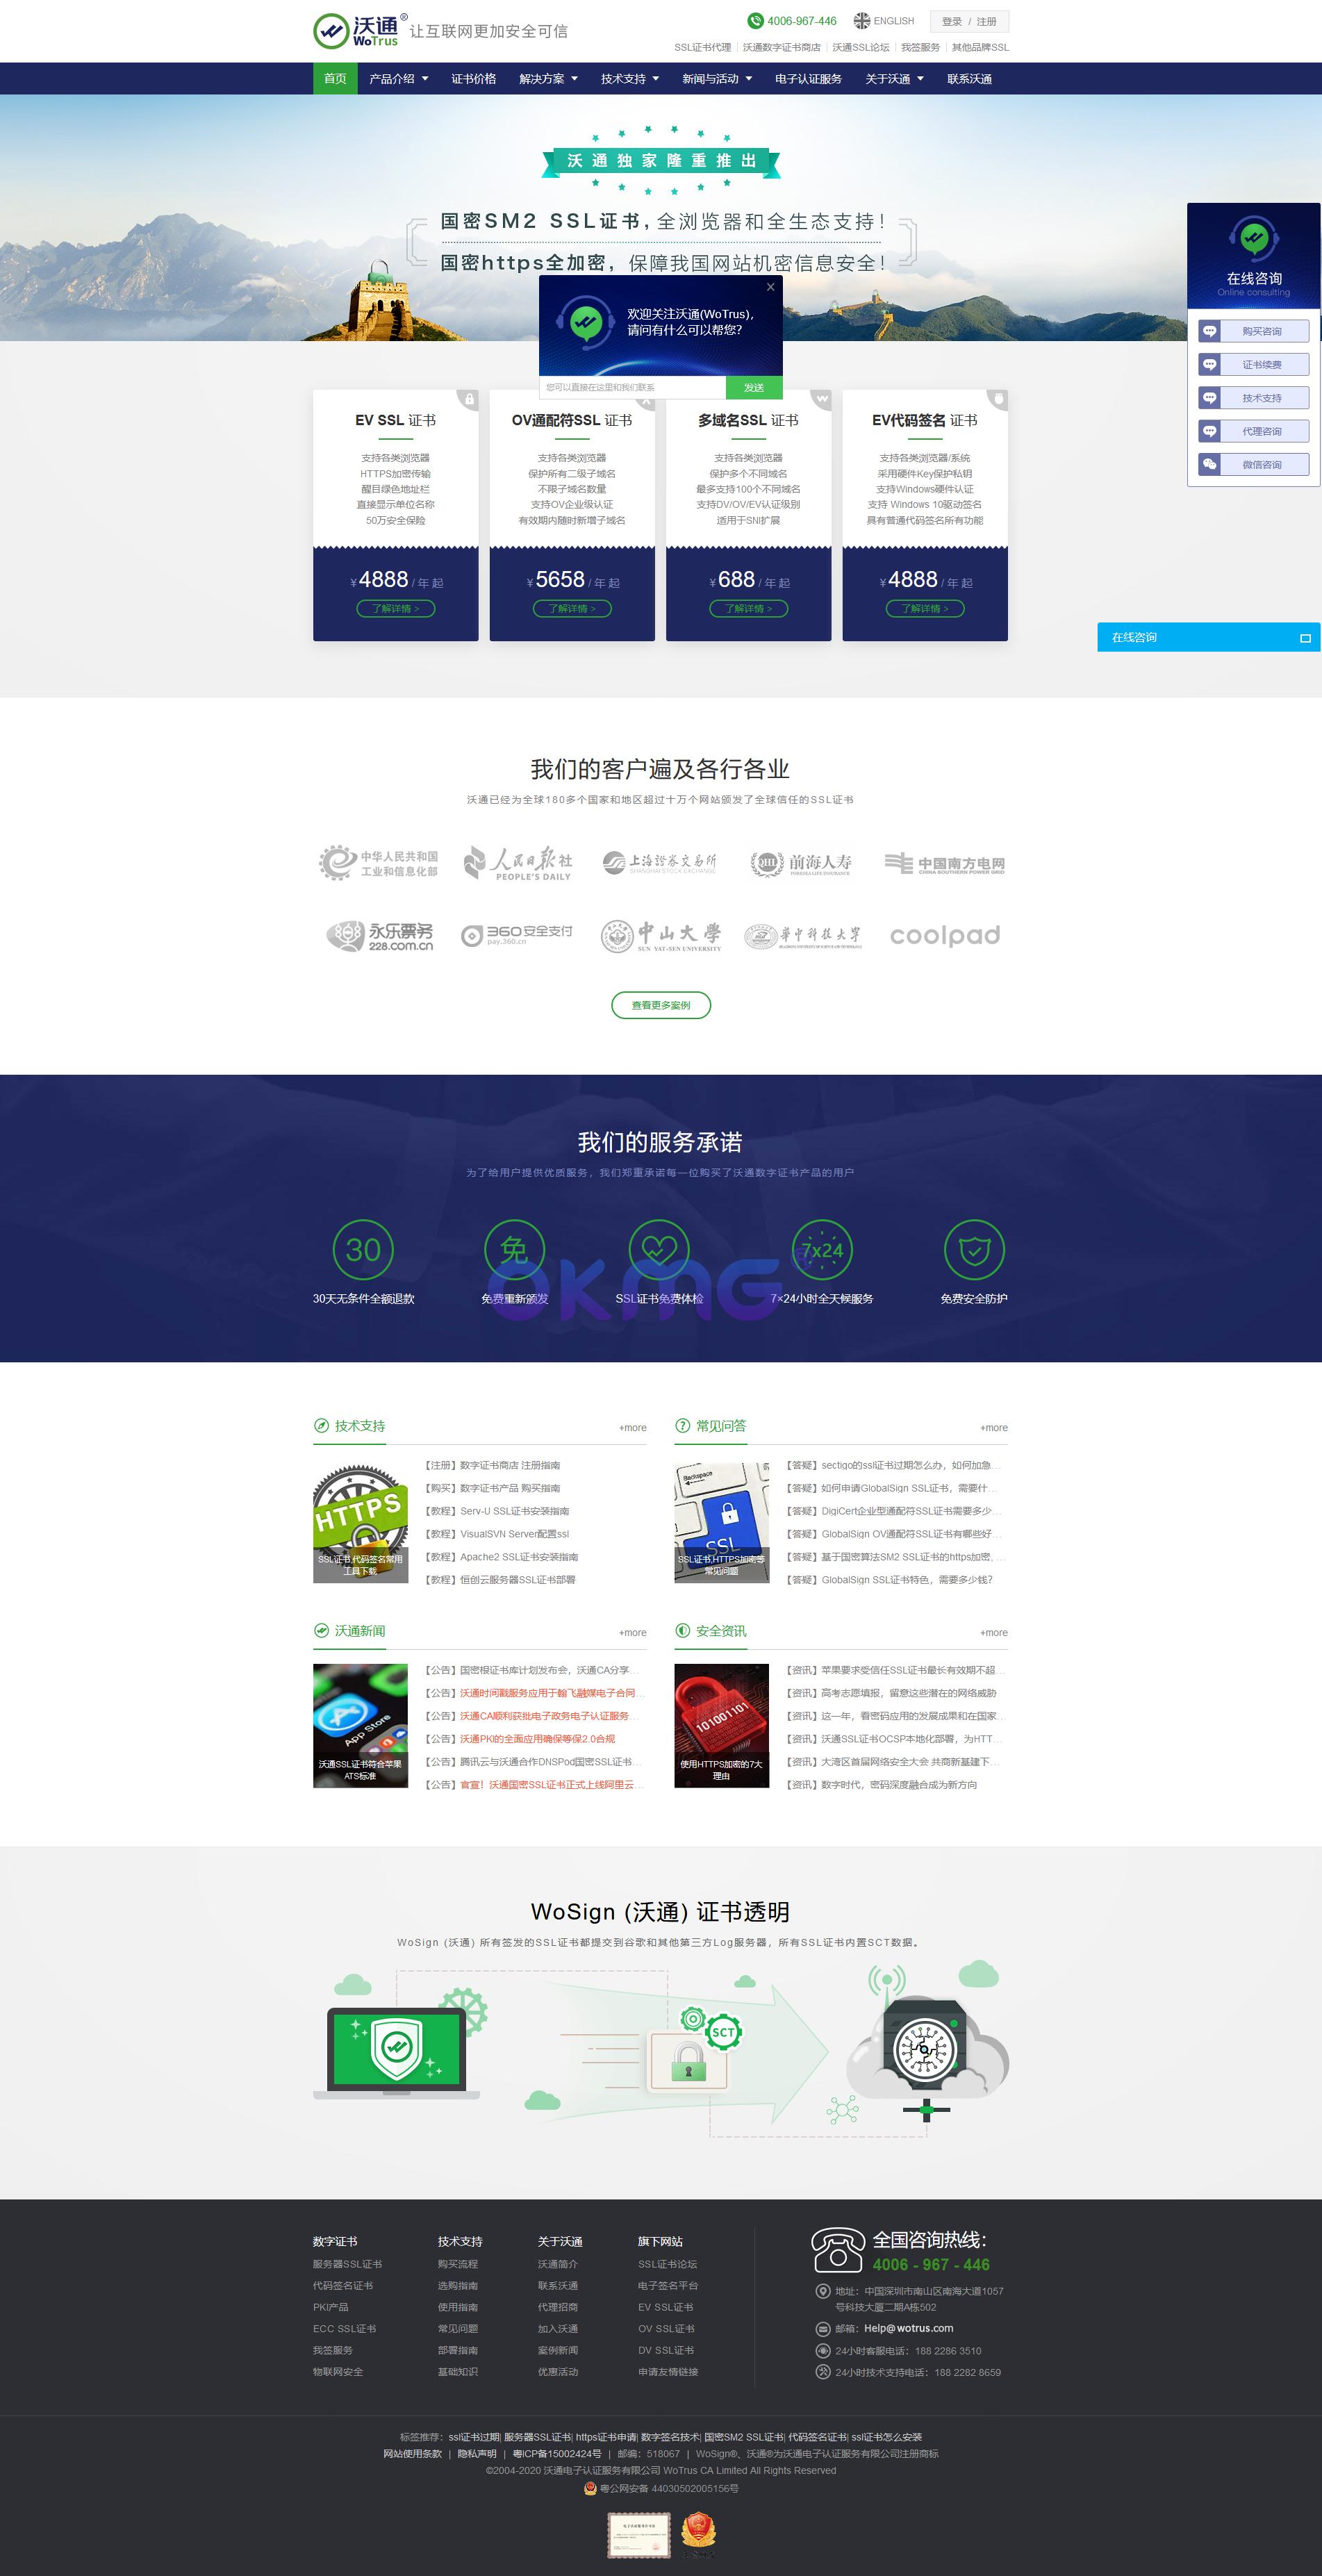 SSL证书_HTTPS加密_SSL数字证书 – 沃通CA【官网】